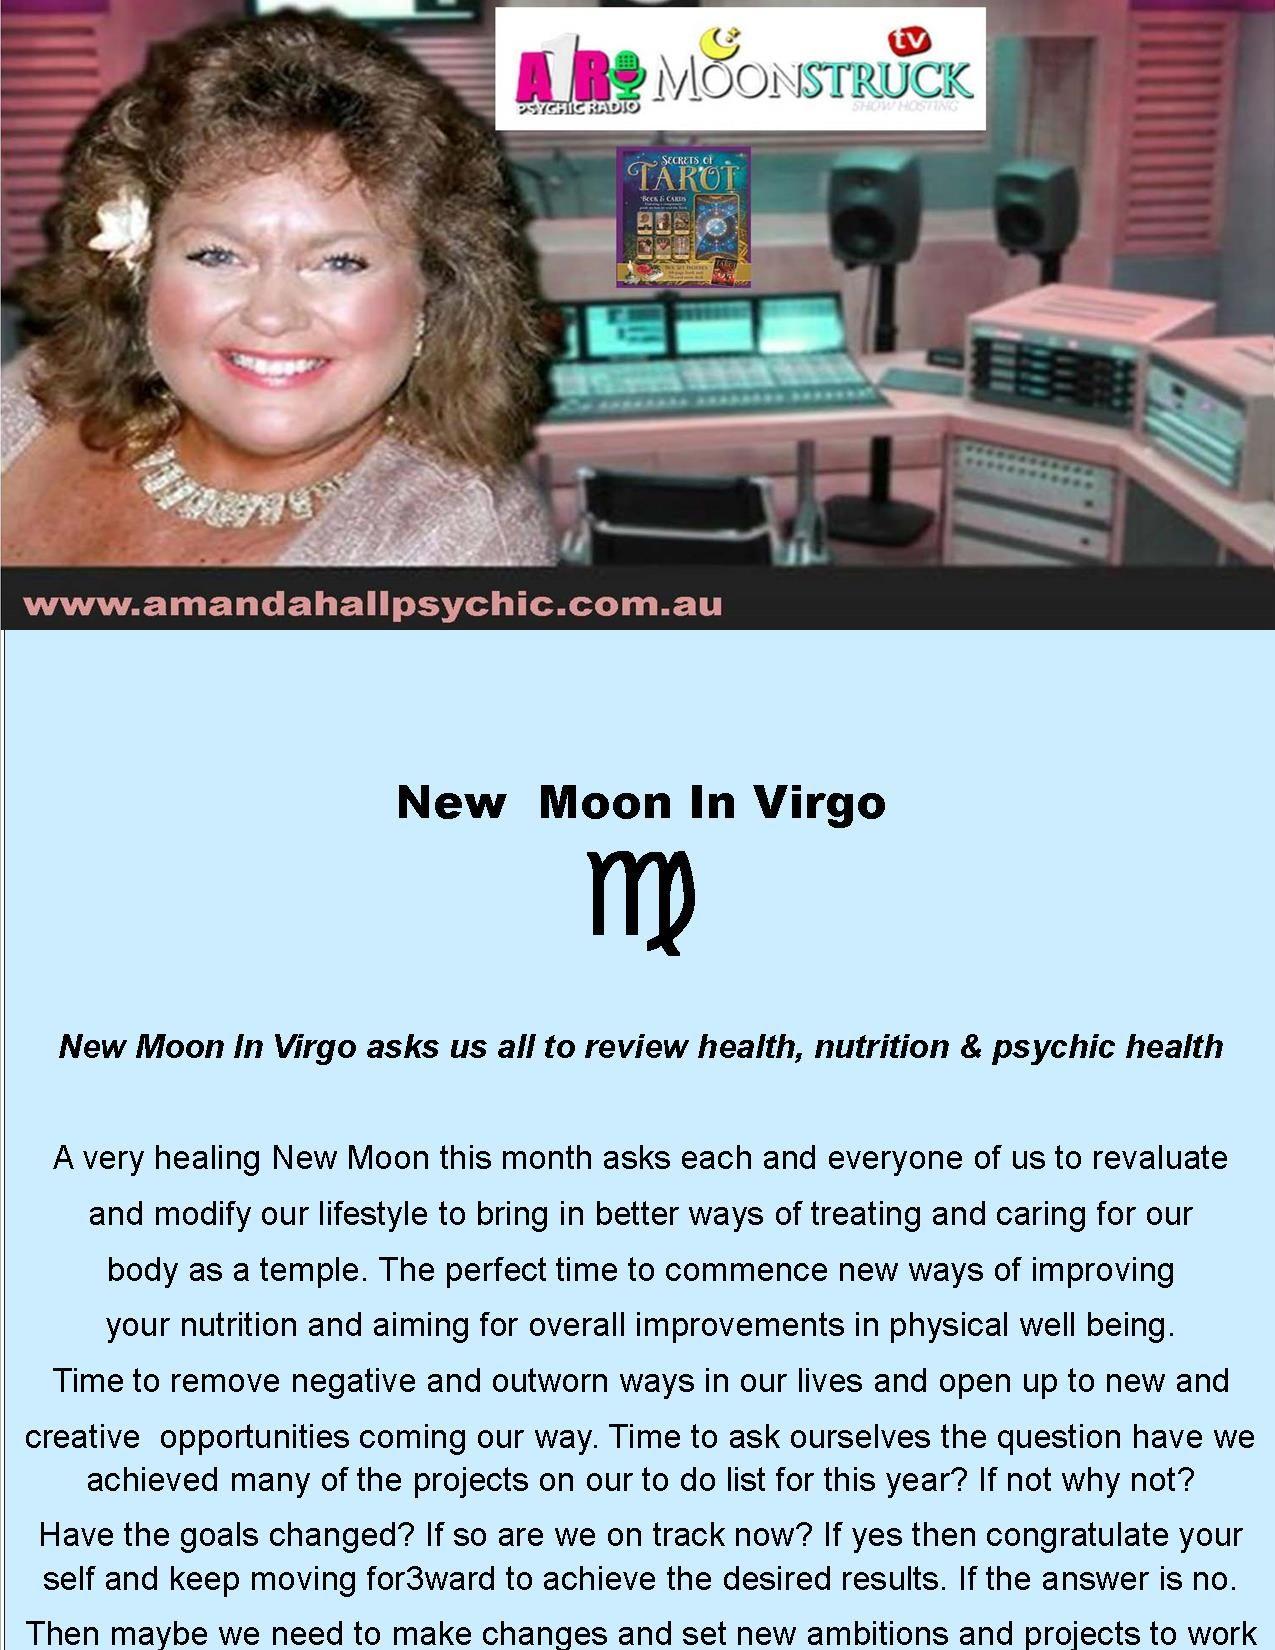 A1r psychic radio on moonstrucktv show with amanda hall